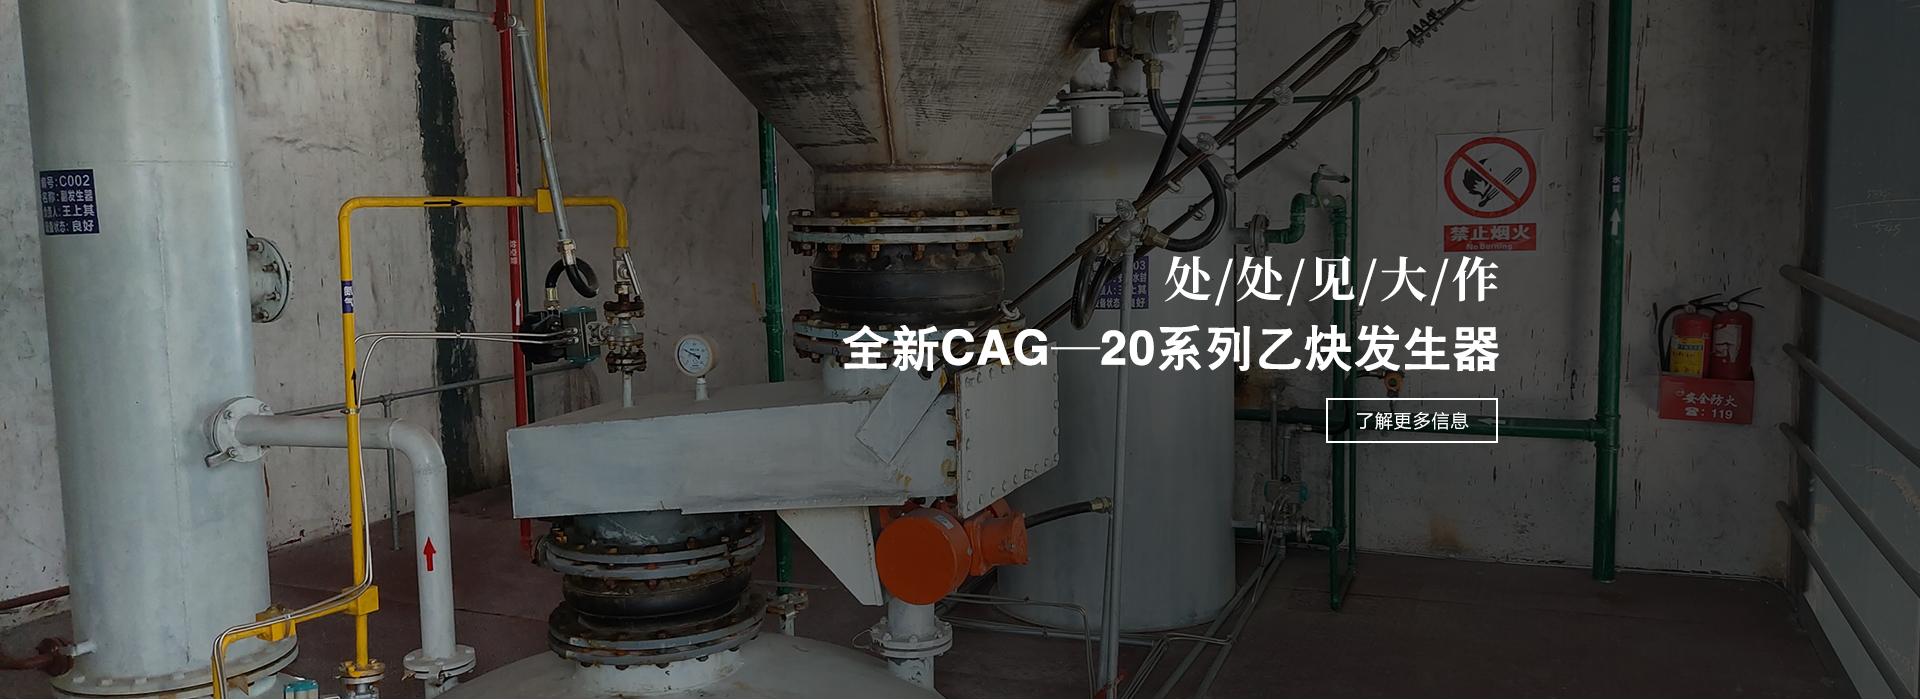 产品子栏目banner